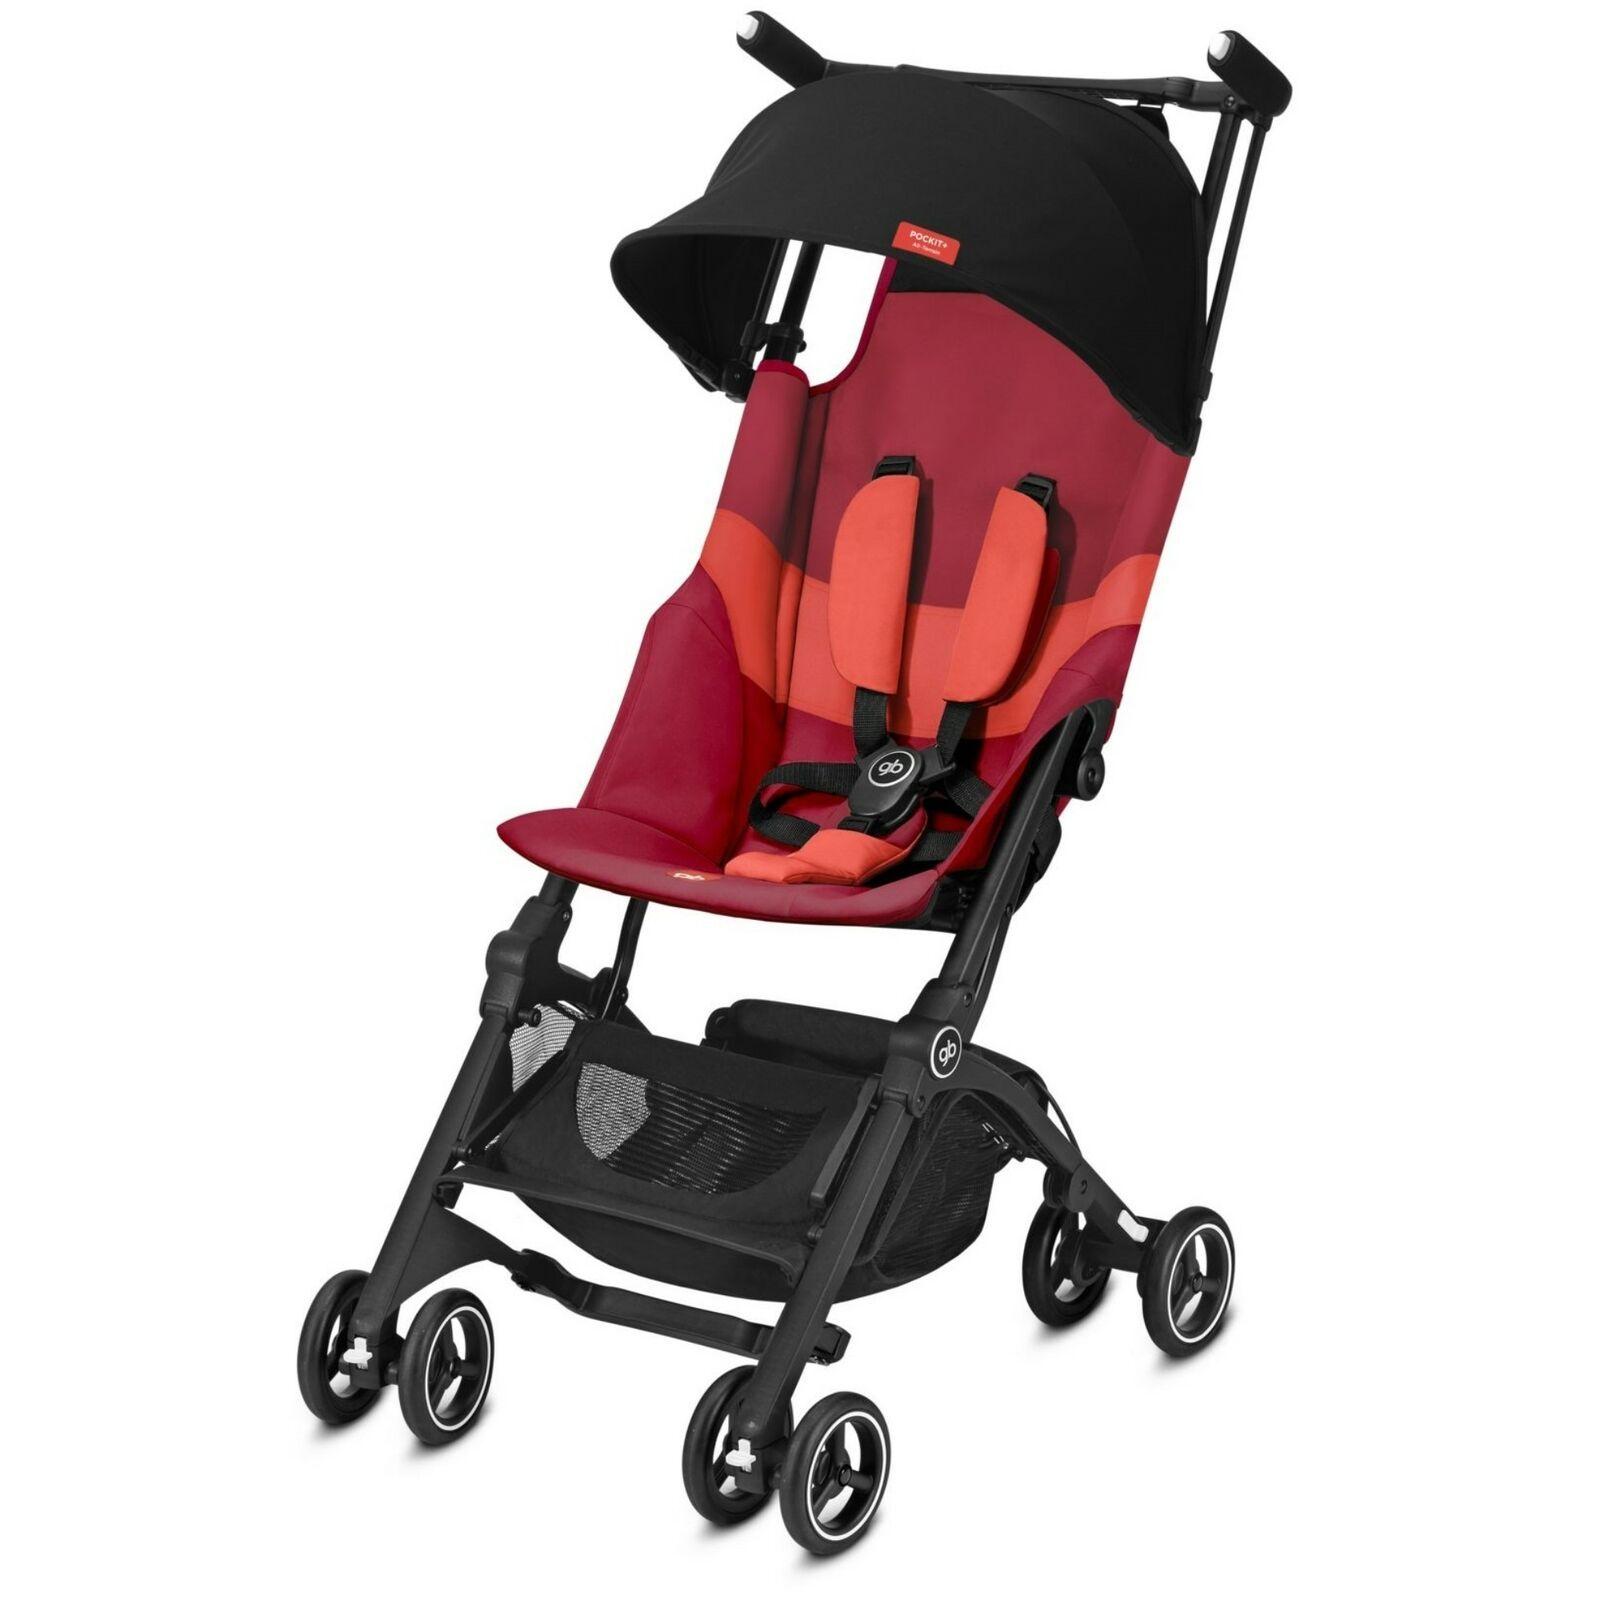 All Terrain Baby Buggy in 2020 Stroller, Baby buggy